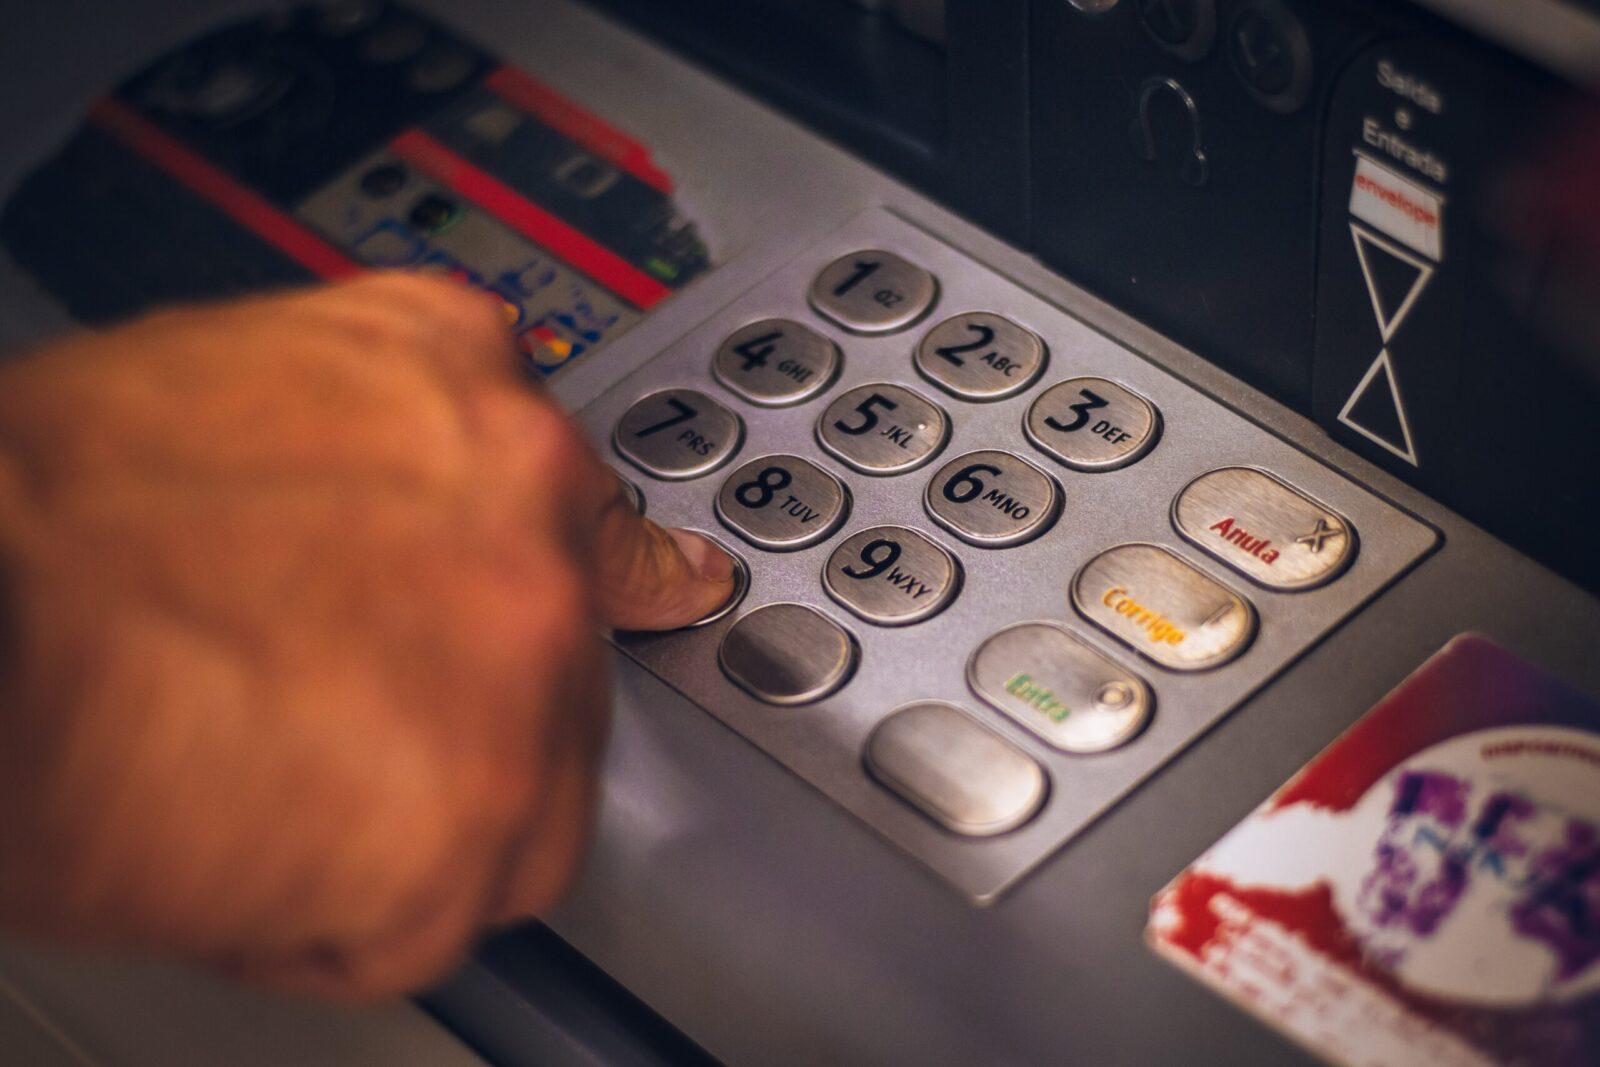 eduardo soares utwypb8 fu8 unsplash scaled - The differences between Banks and eMoney Institutions